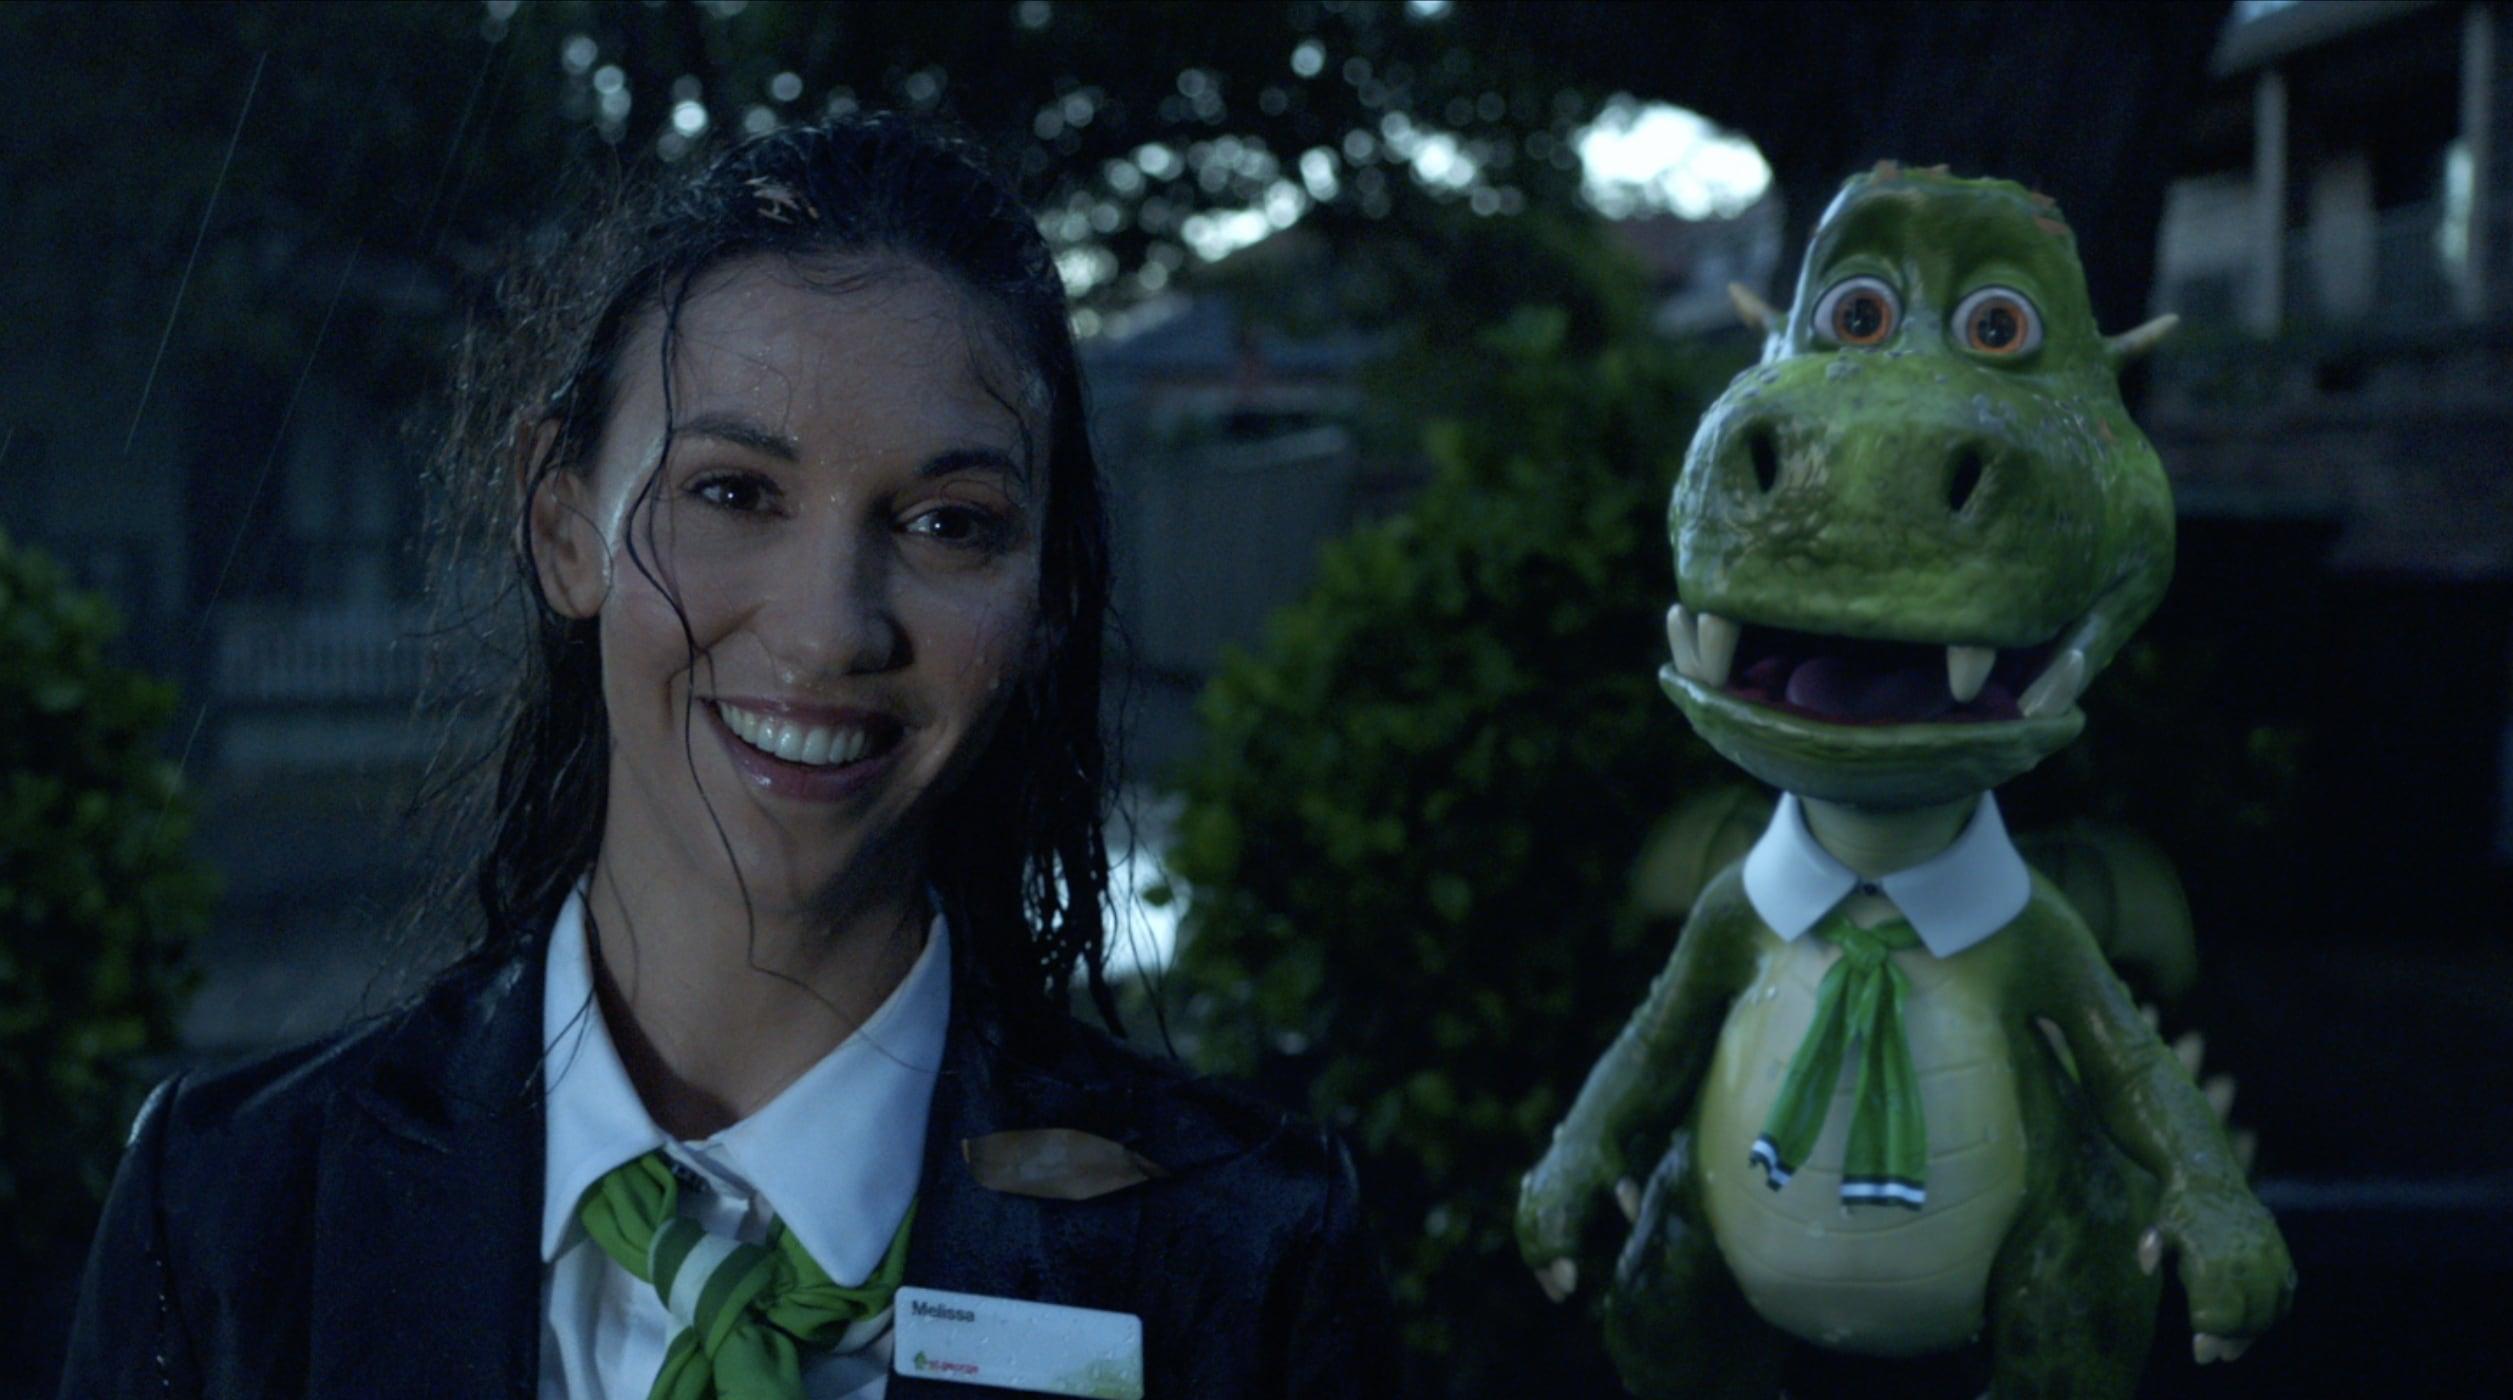 St.George launches new 'Little Dragon' brand campaign via Saatchi & Saatchi, Sydney